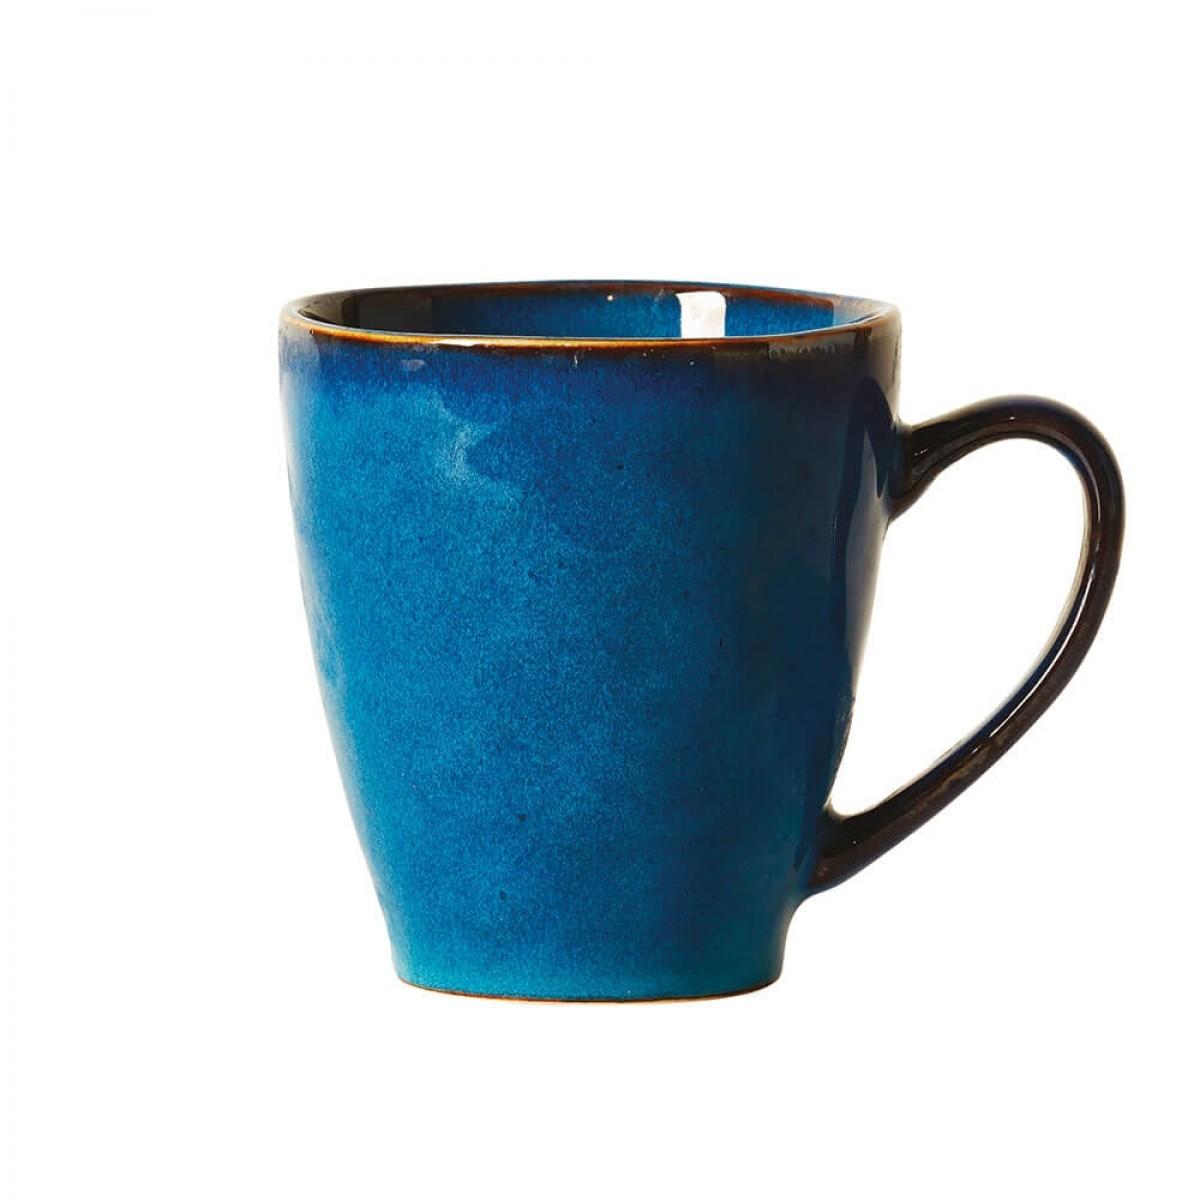 DACORE Krus med hank stentøj 10,5 x 11,5 cm blå